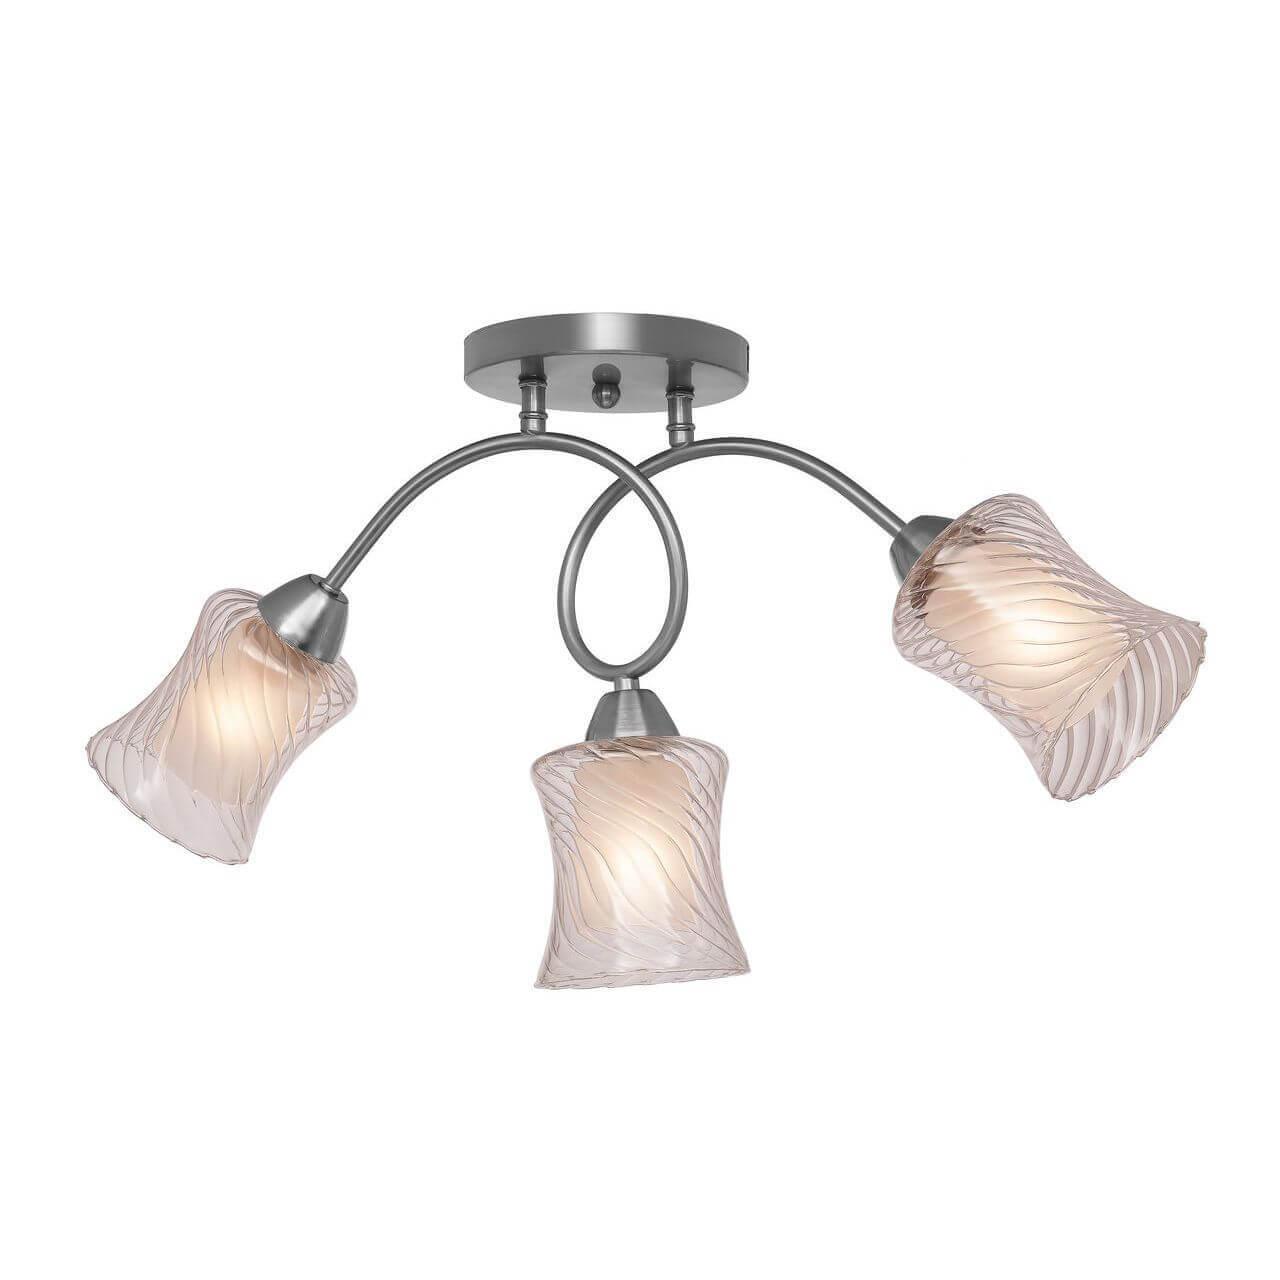 Потолочная люстра Silver Light Evita 132.55.3 потолочная люстра silver light evita 132 55 3